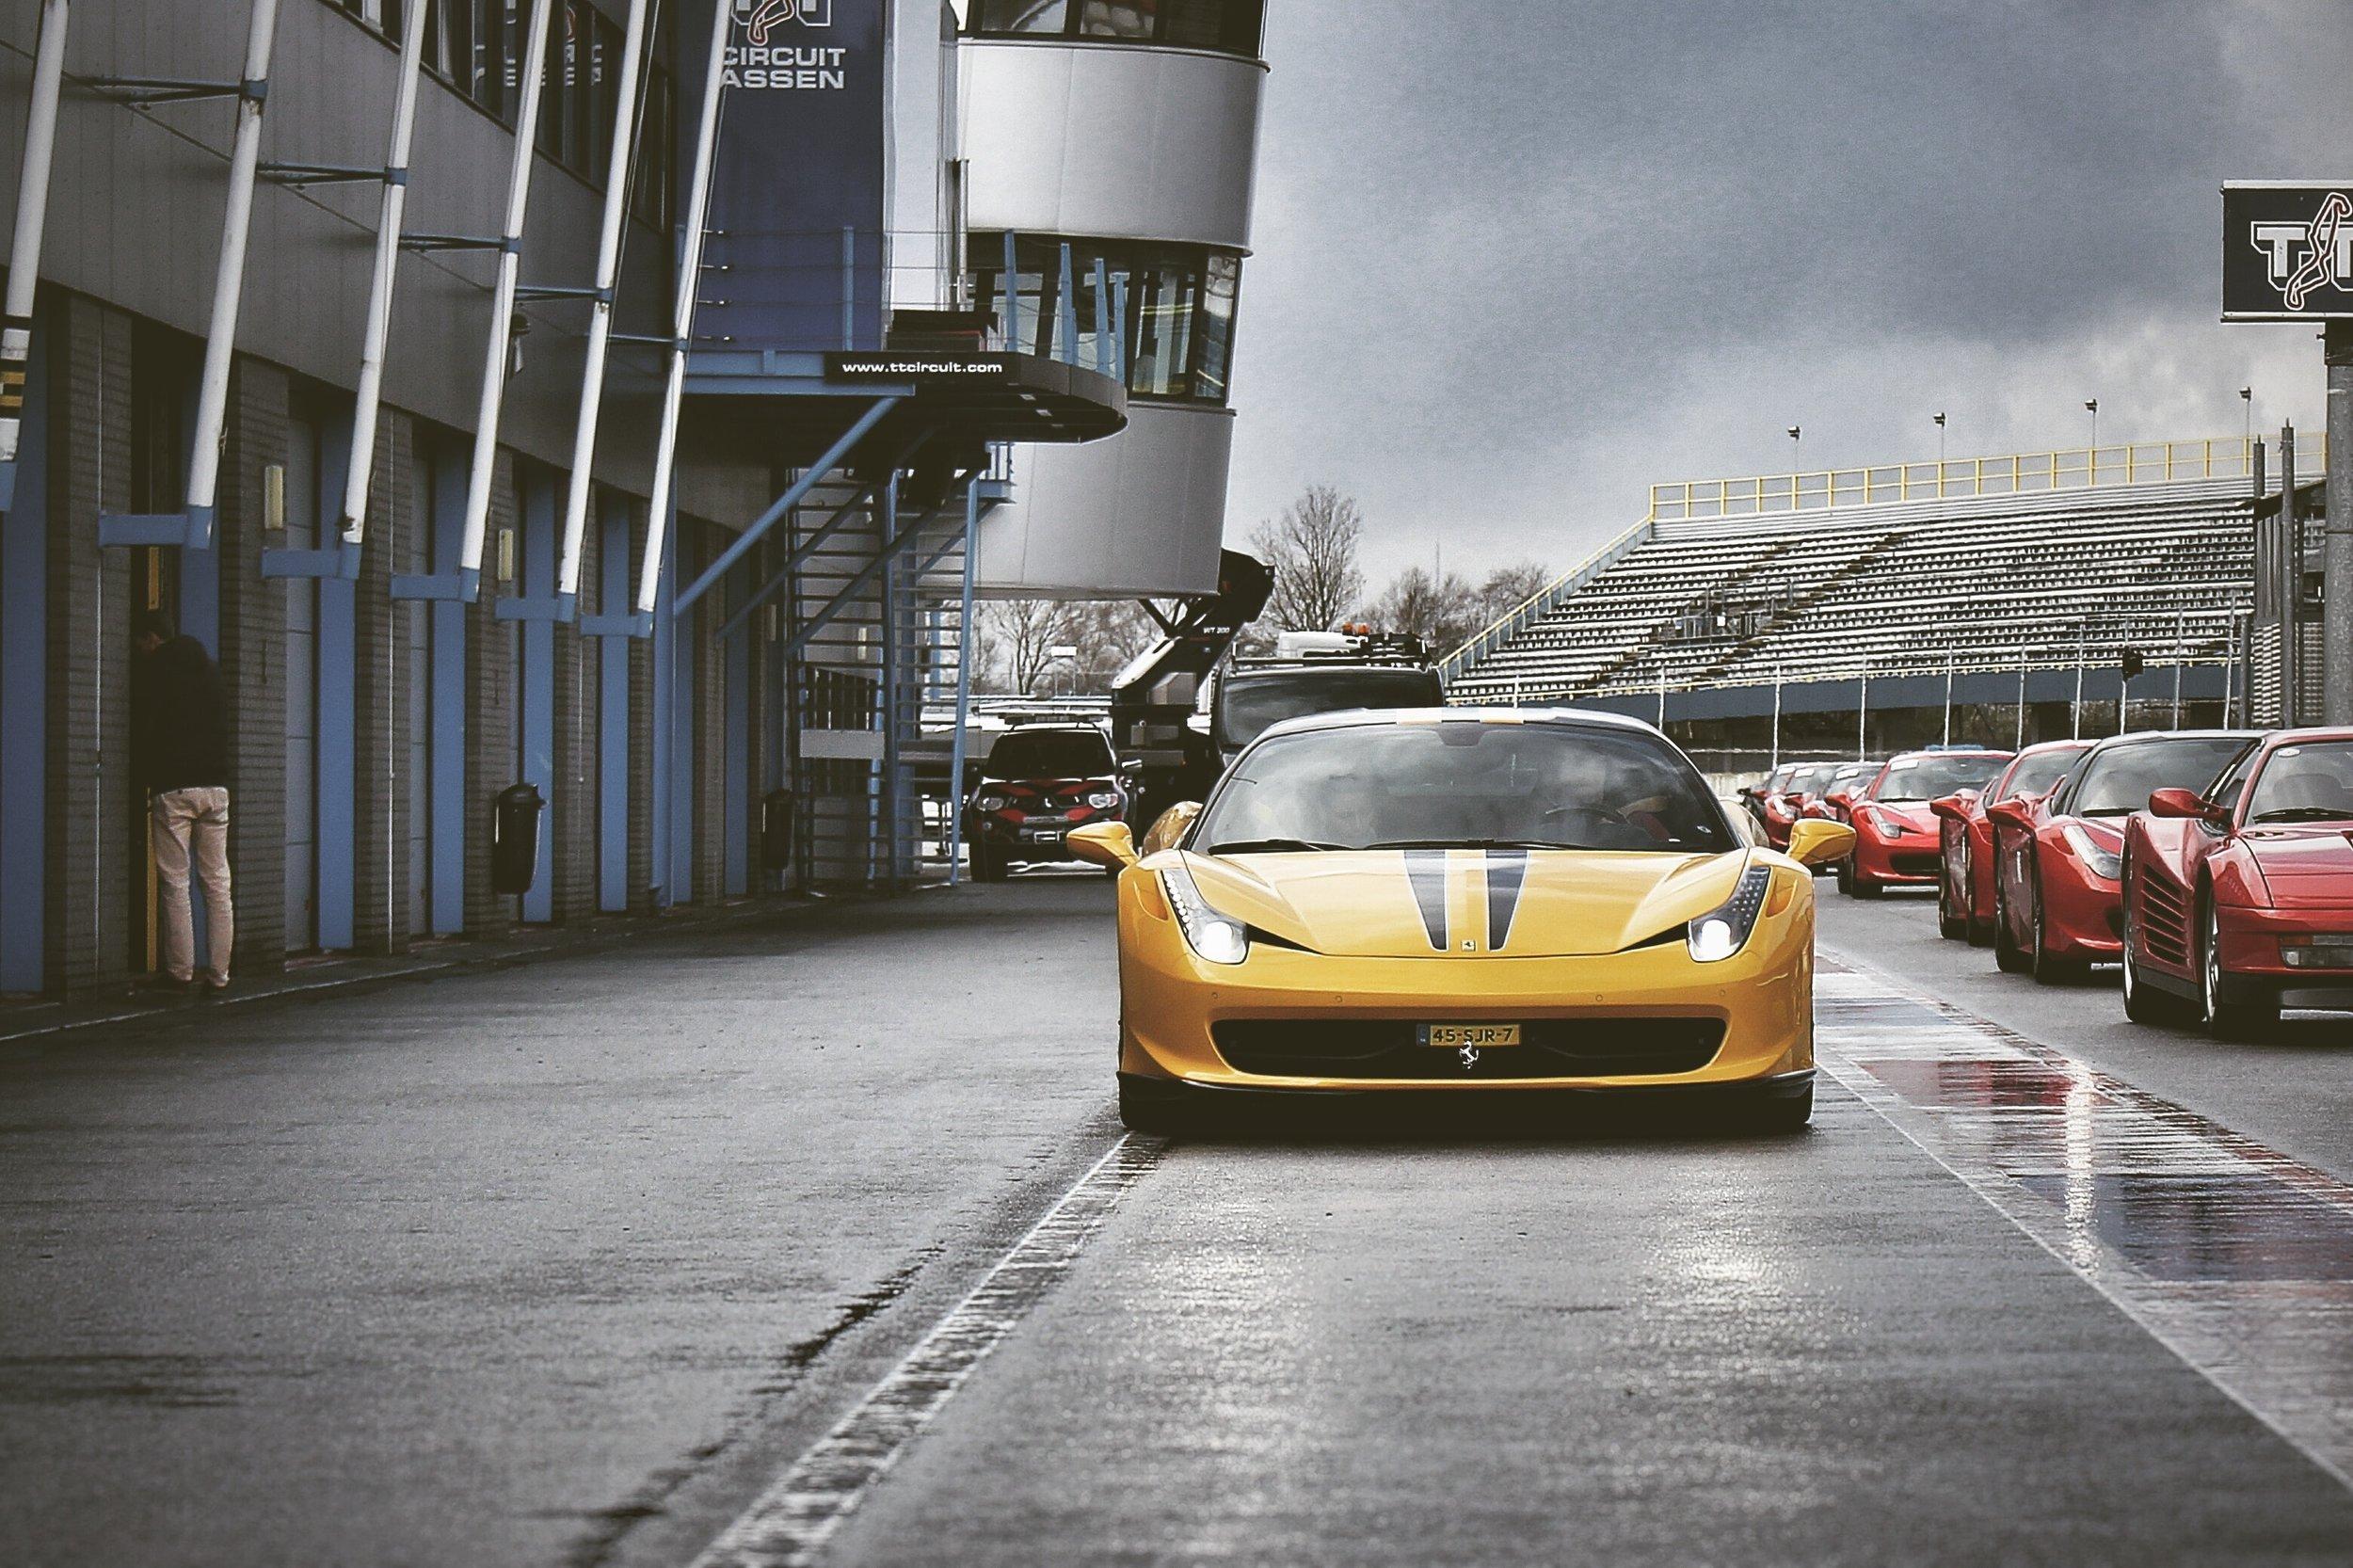 asphalt-automobile-automotive-724495.jpg